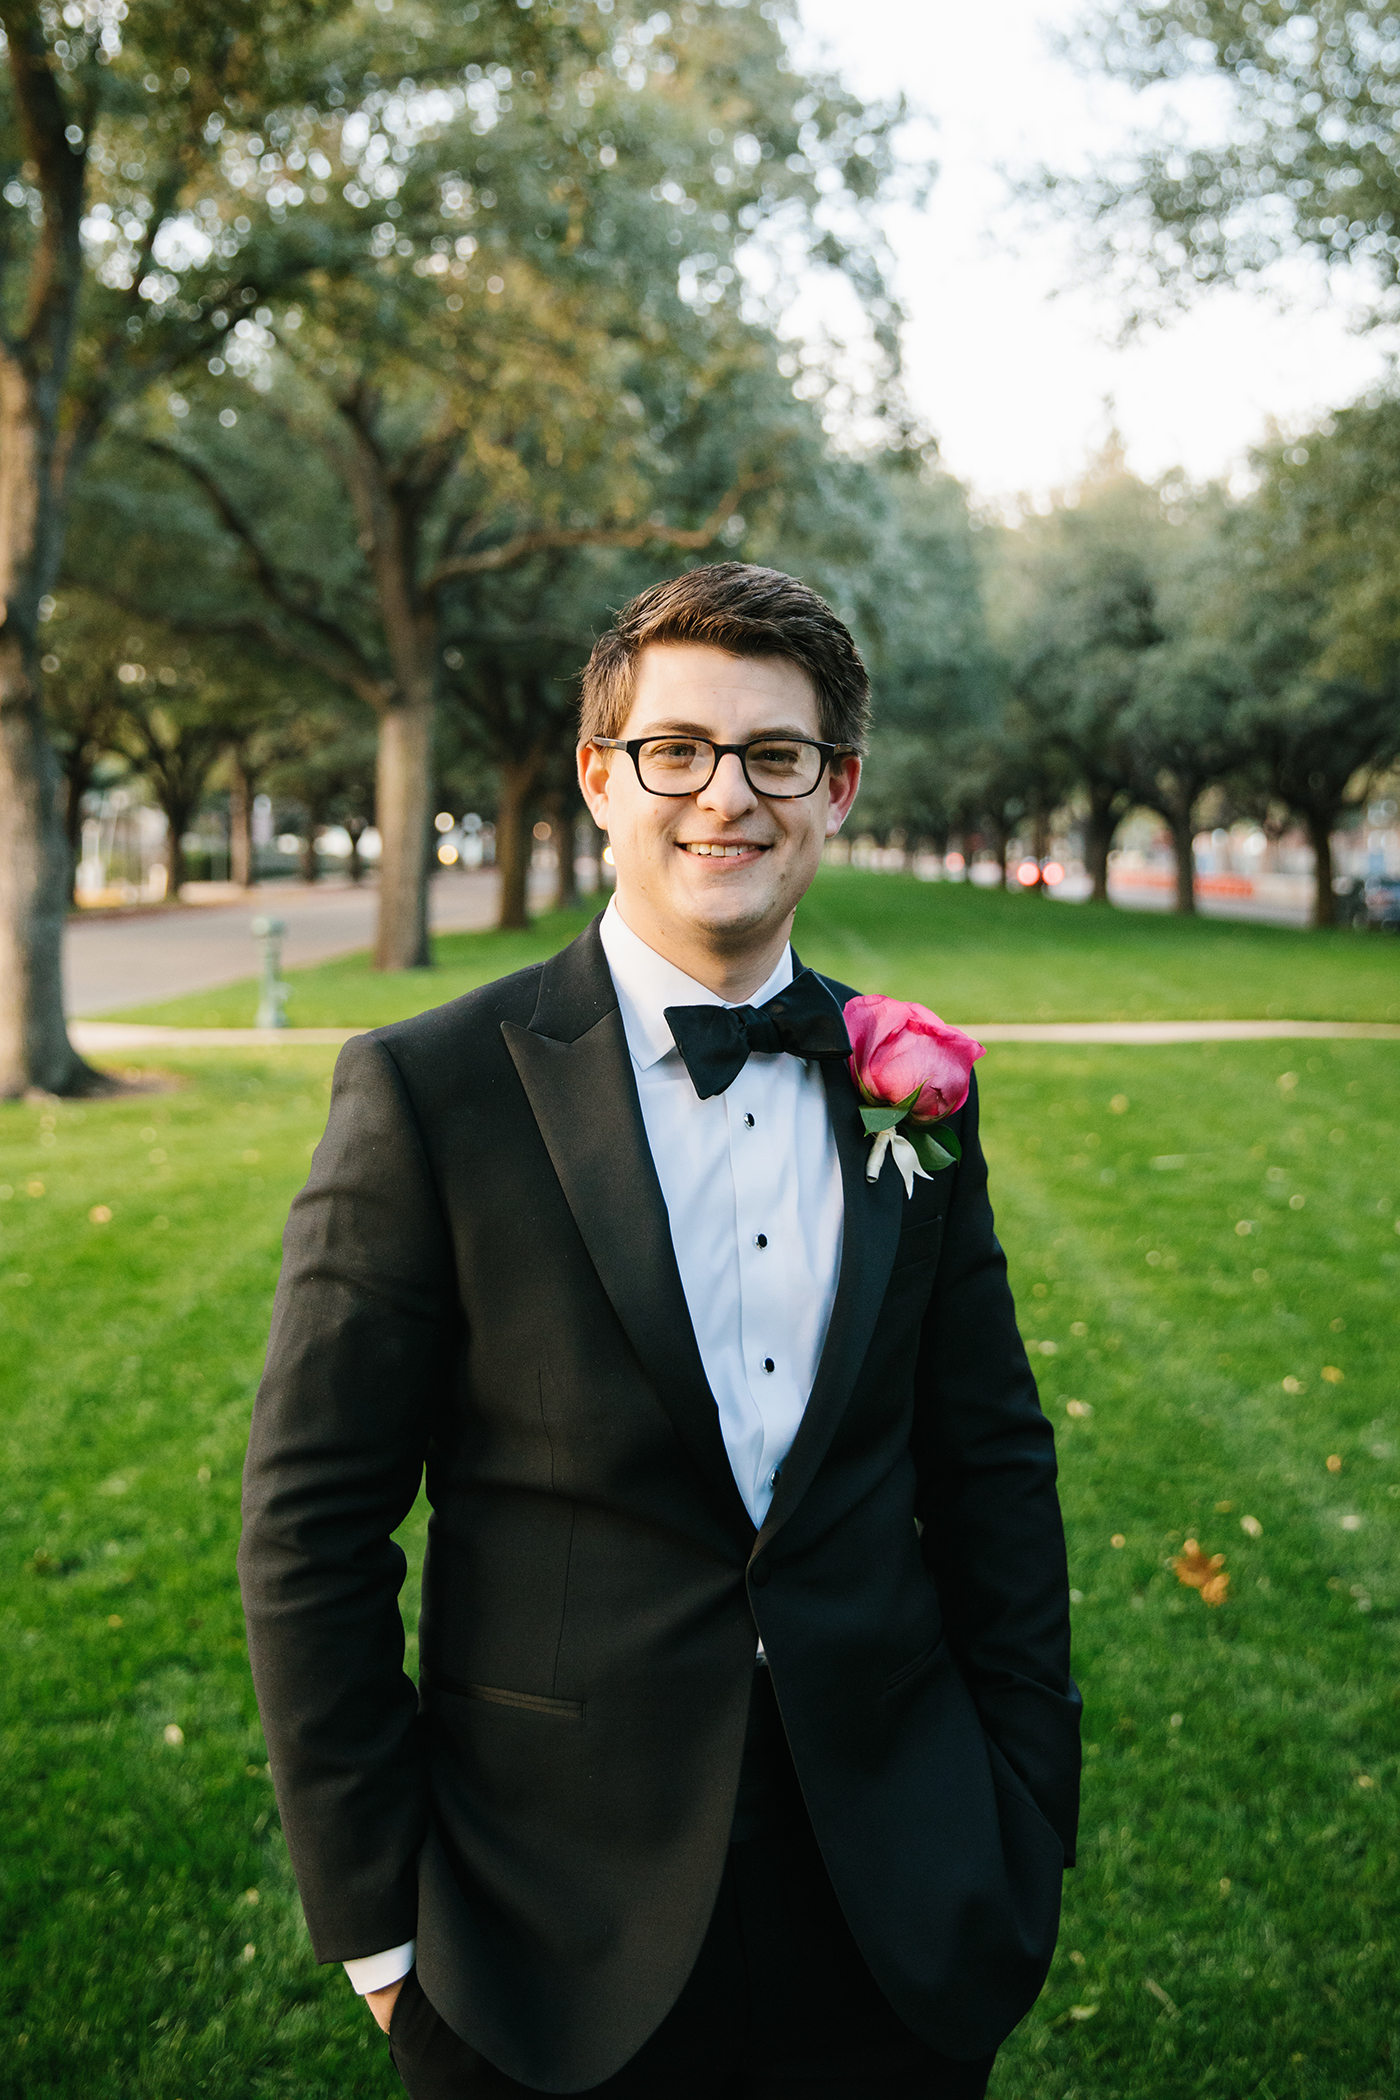 Dallas Weddings Planner - Allday Events - Katie + Matthew at The Adolphus Hotel - 496.jpg